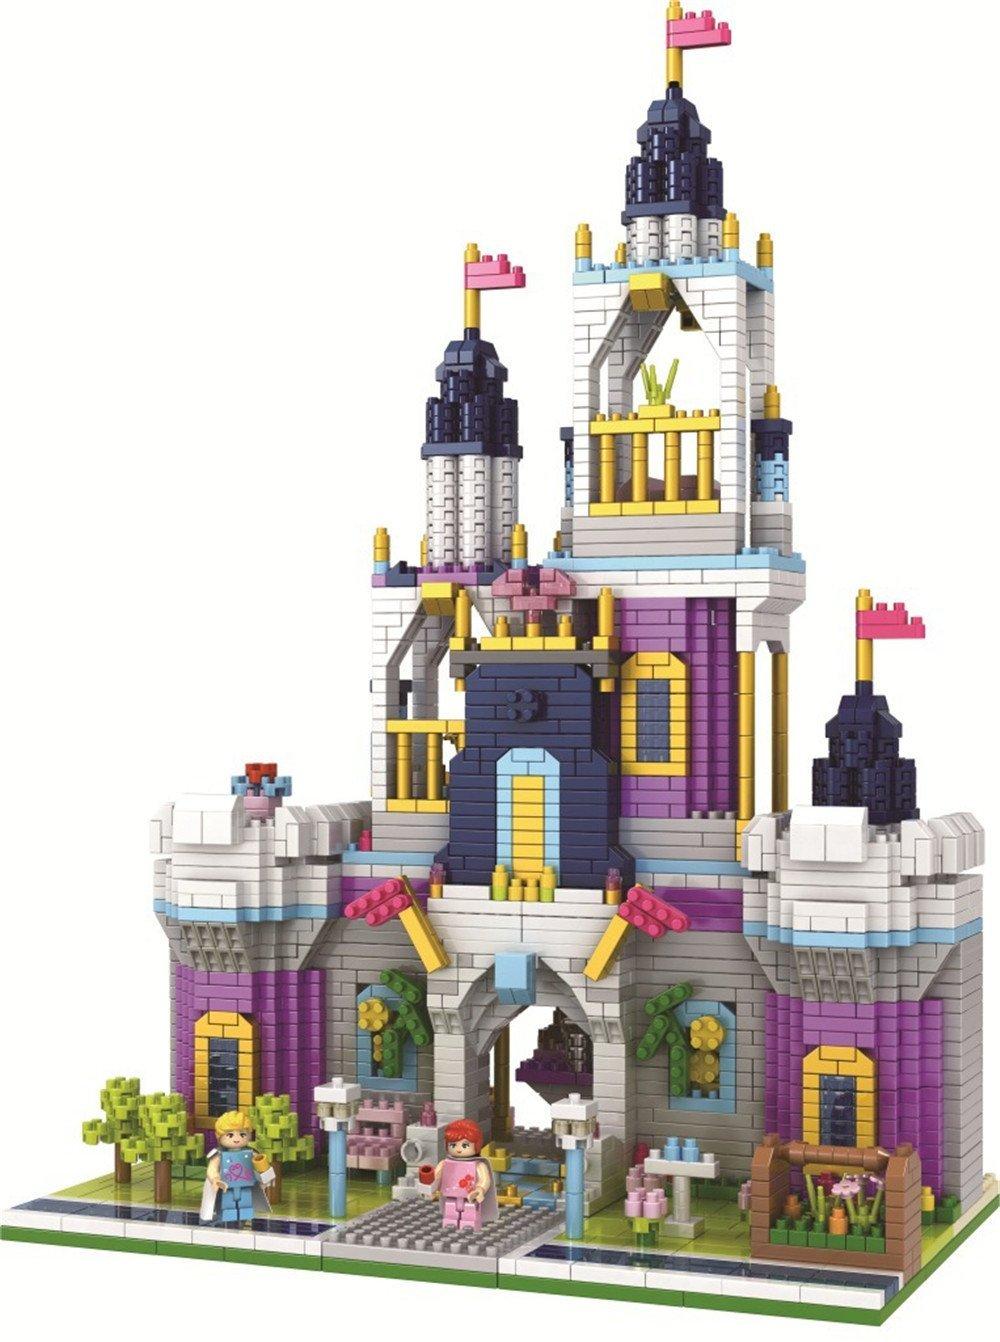 PZX Girls Blocks Princess Castle Toys for Girls Pink Palace Building Block Bricks Toys Construction Set for Kids 2800 Pcs